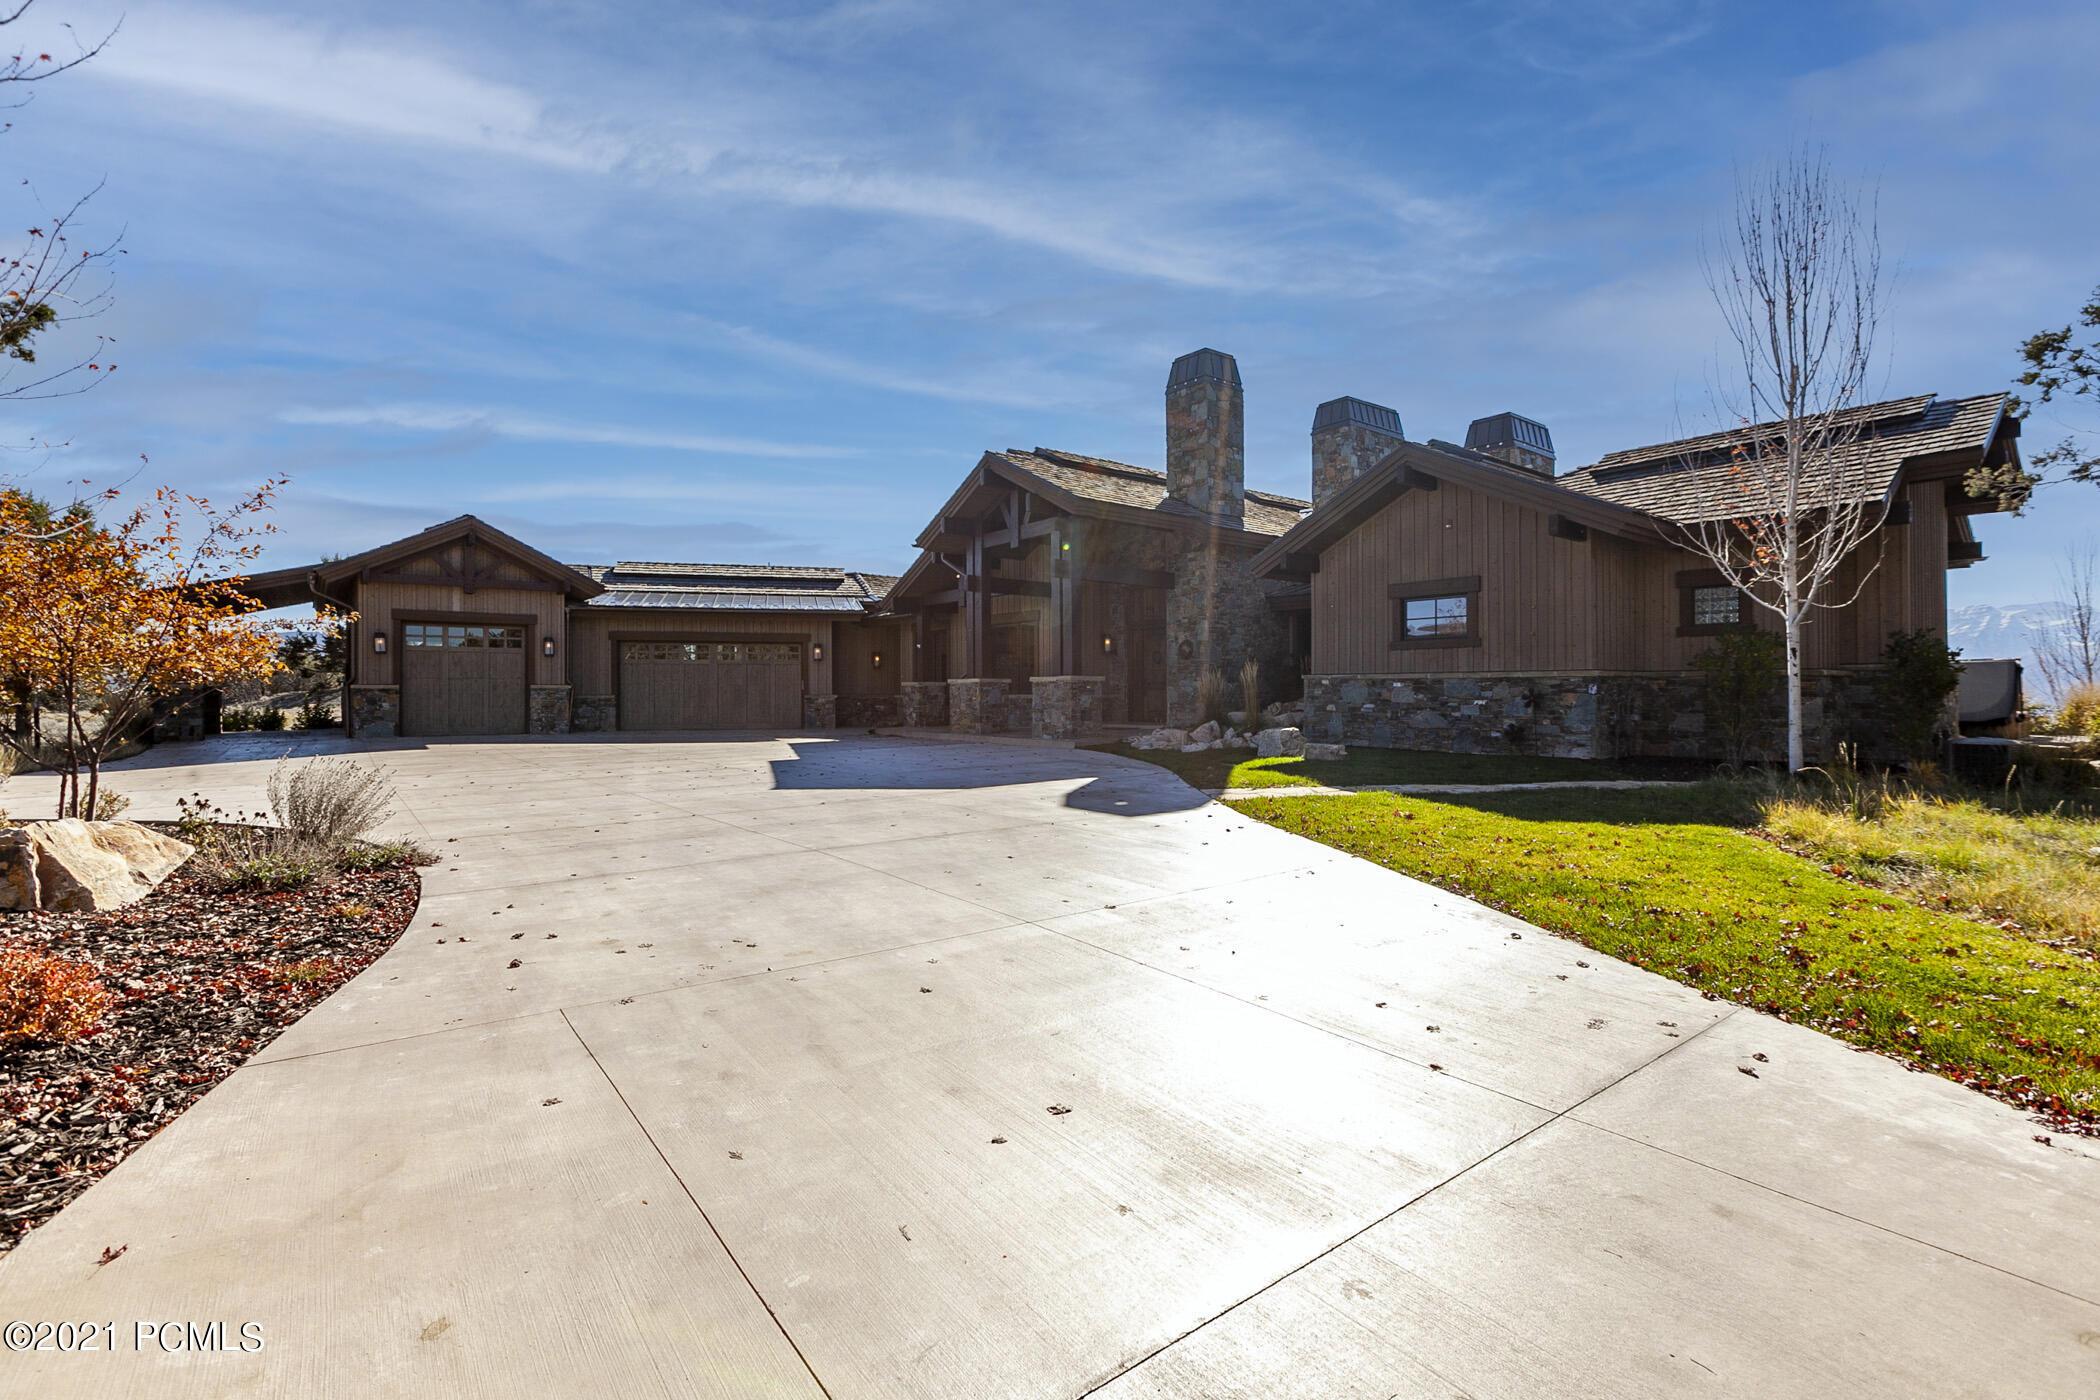 663 Explorer Peak Drive, Heber City, Utah 84032, 4 Bedrooms Bedrooms, ,5 BathroomsBathrooms,Single Family,For Sale,Explorer Peak,12104263